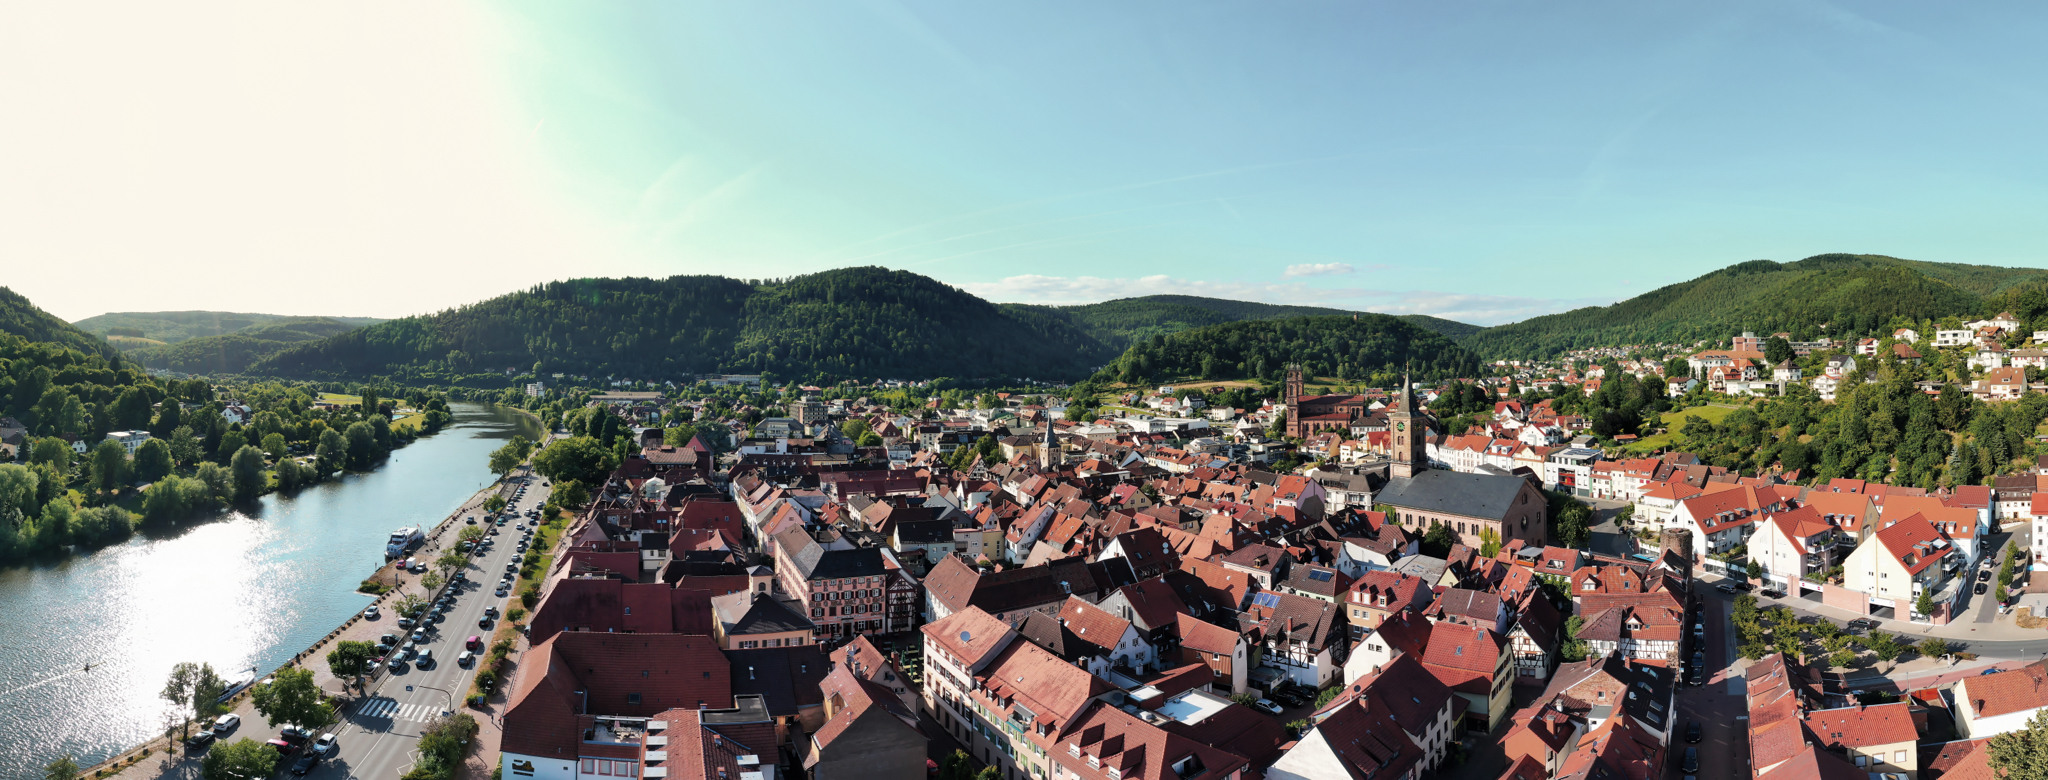 Treppenlifte mit Beratung in Karlsruhe